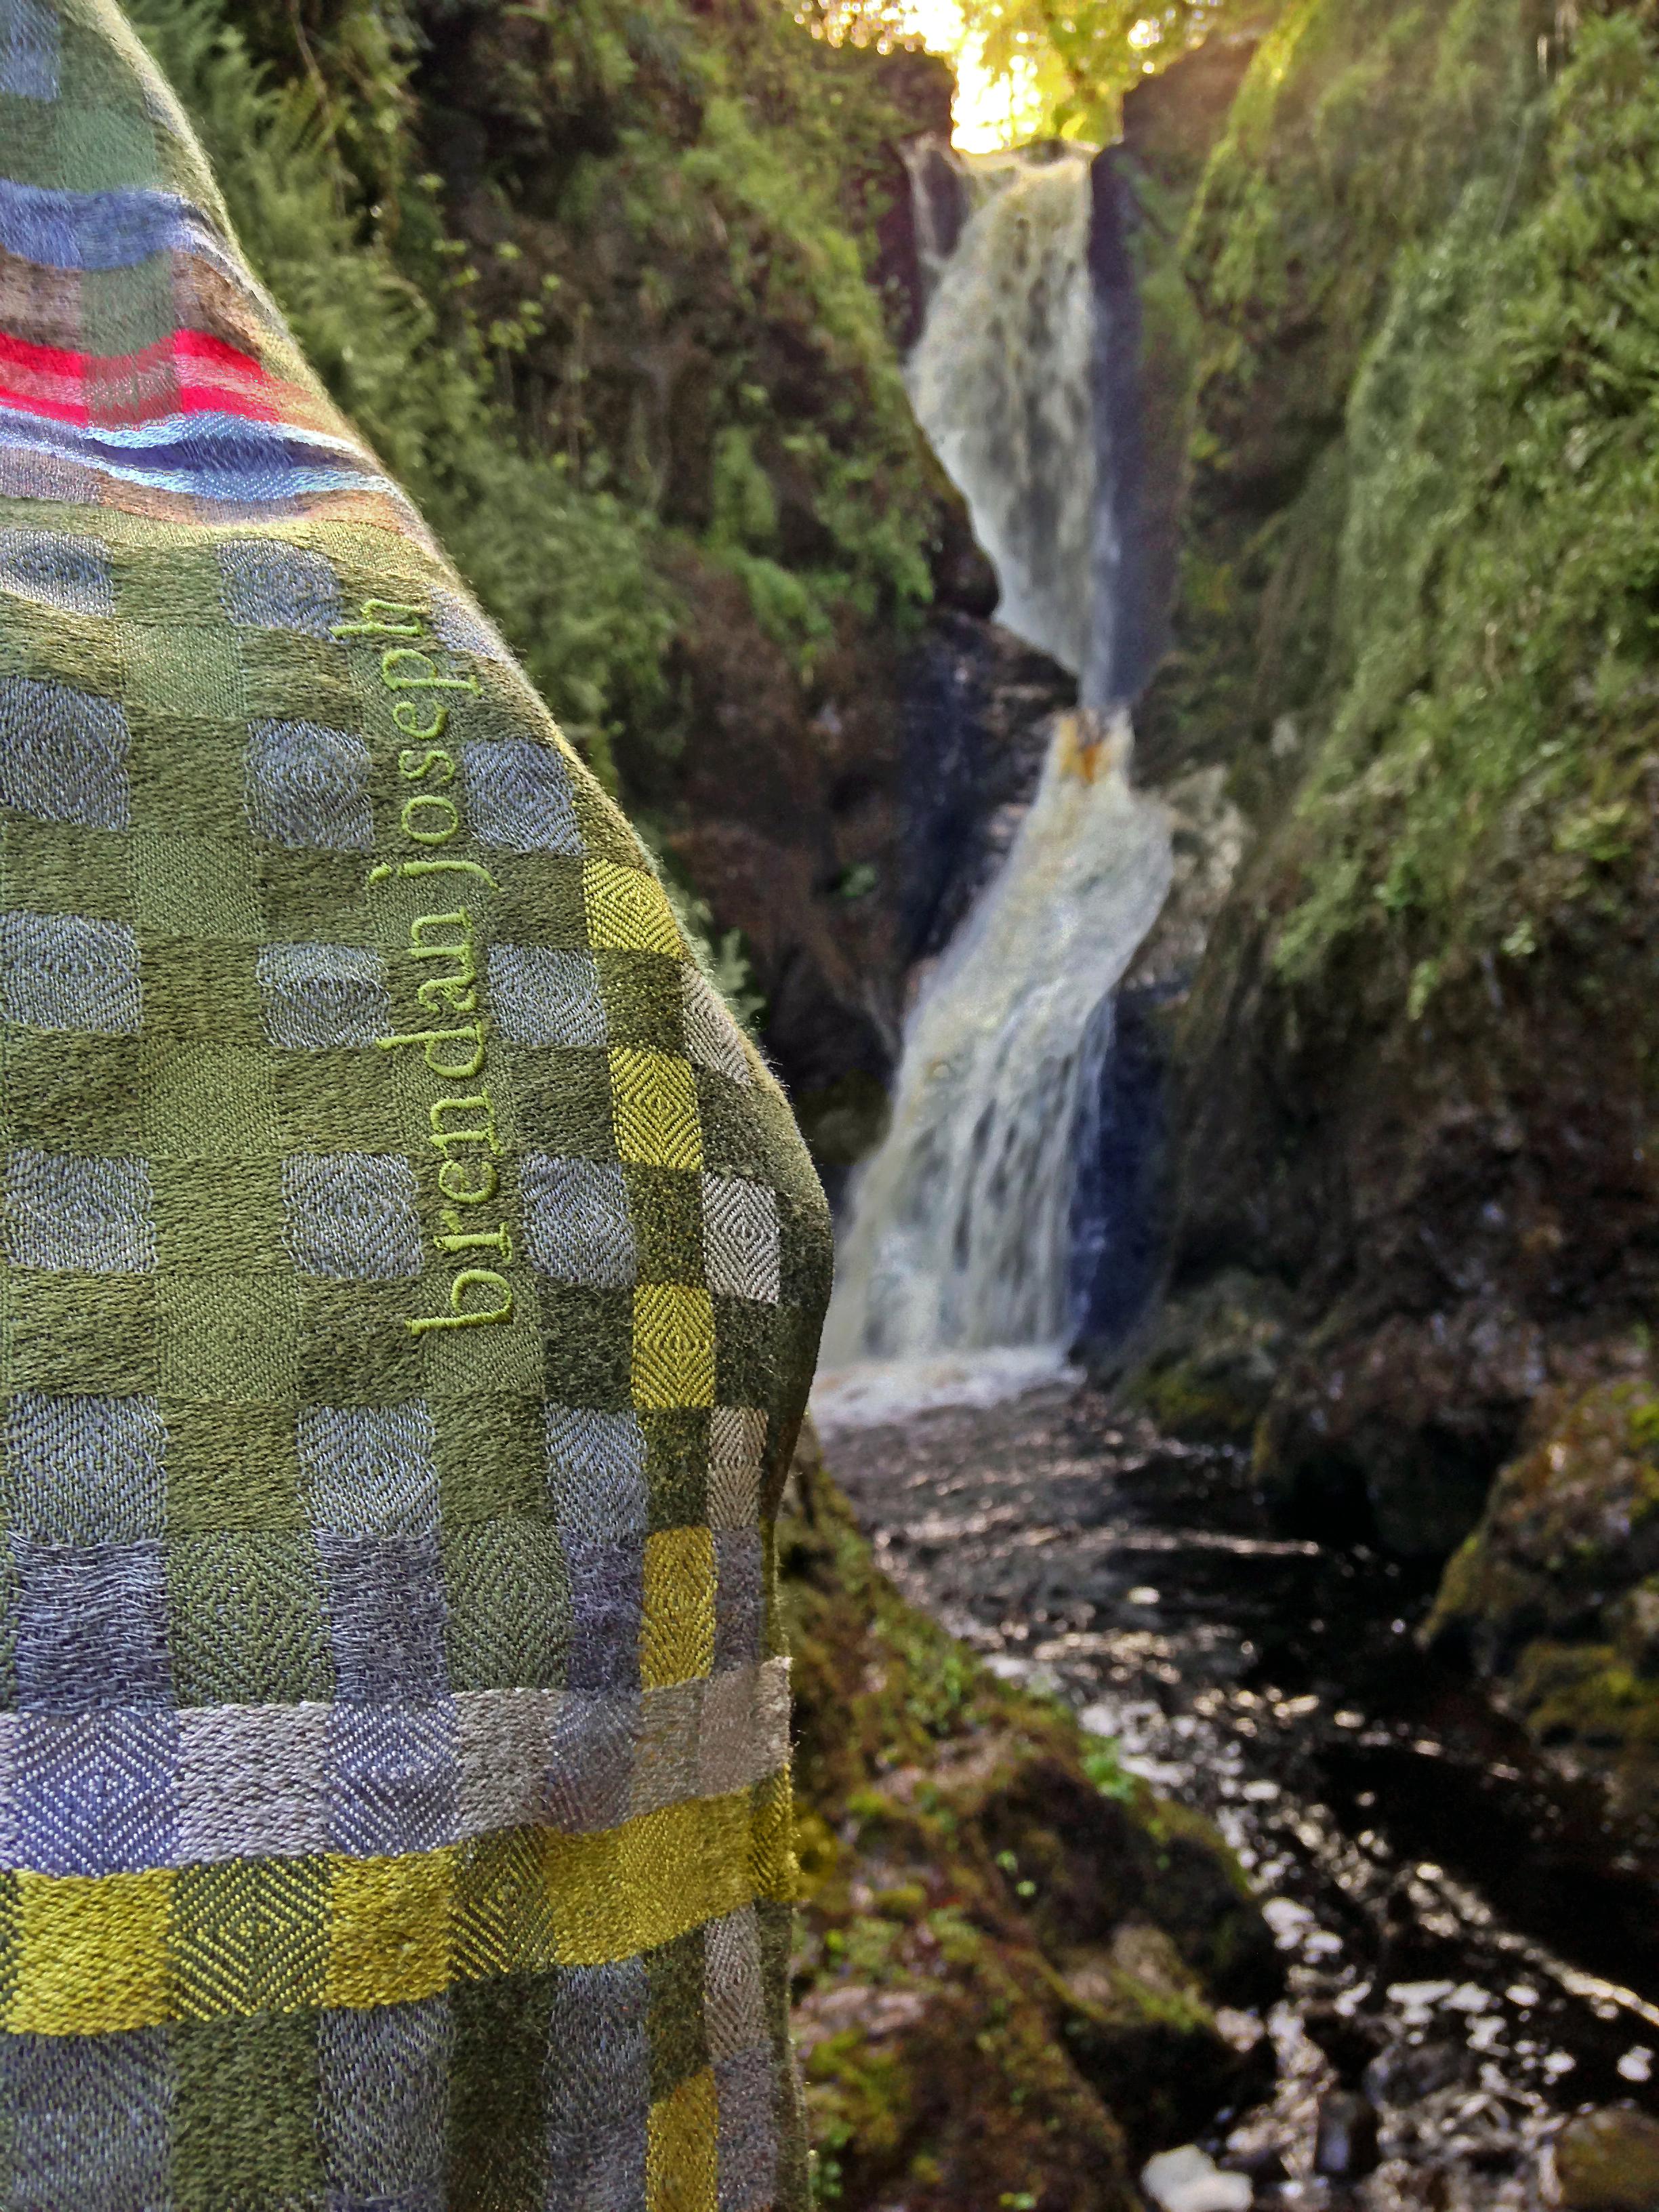 glenariff-waterfall-glens-of-antrim-weaving-northern-ireland-scarf-irish-landscape-waterfalls